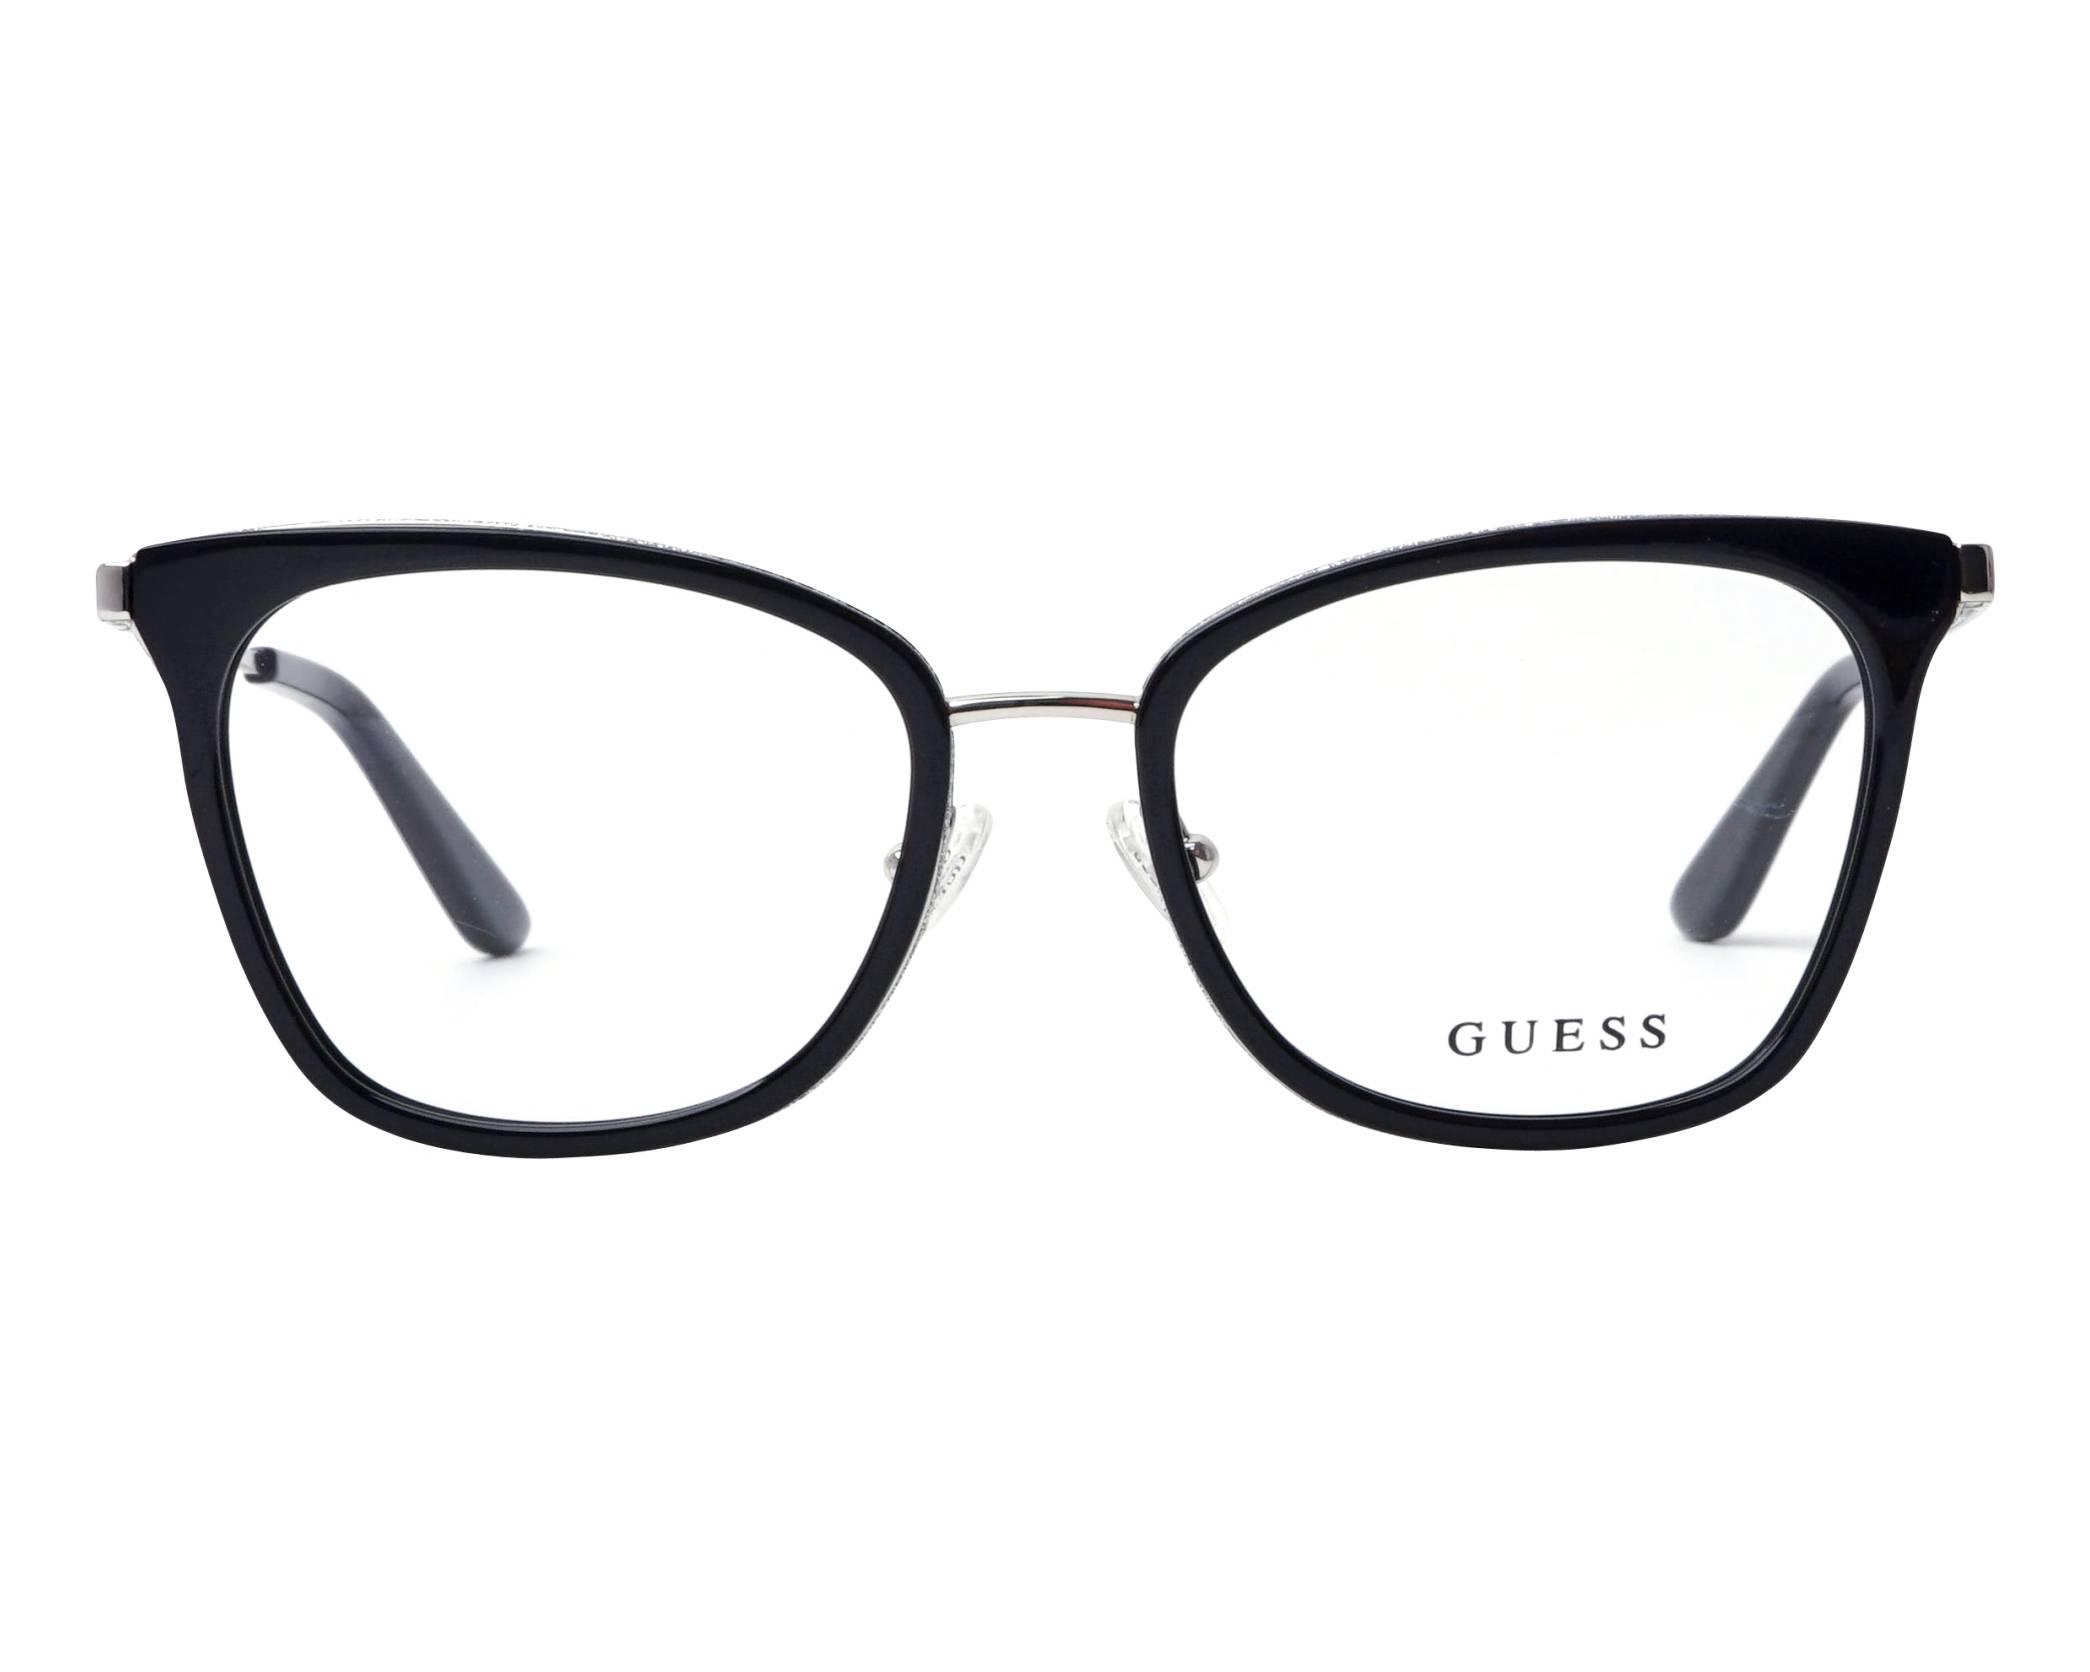 2a0e3ef60f0 eyeglasses Guess GU-2706-V 001 52-17 Black Silver front view